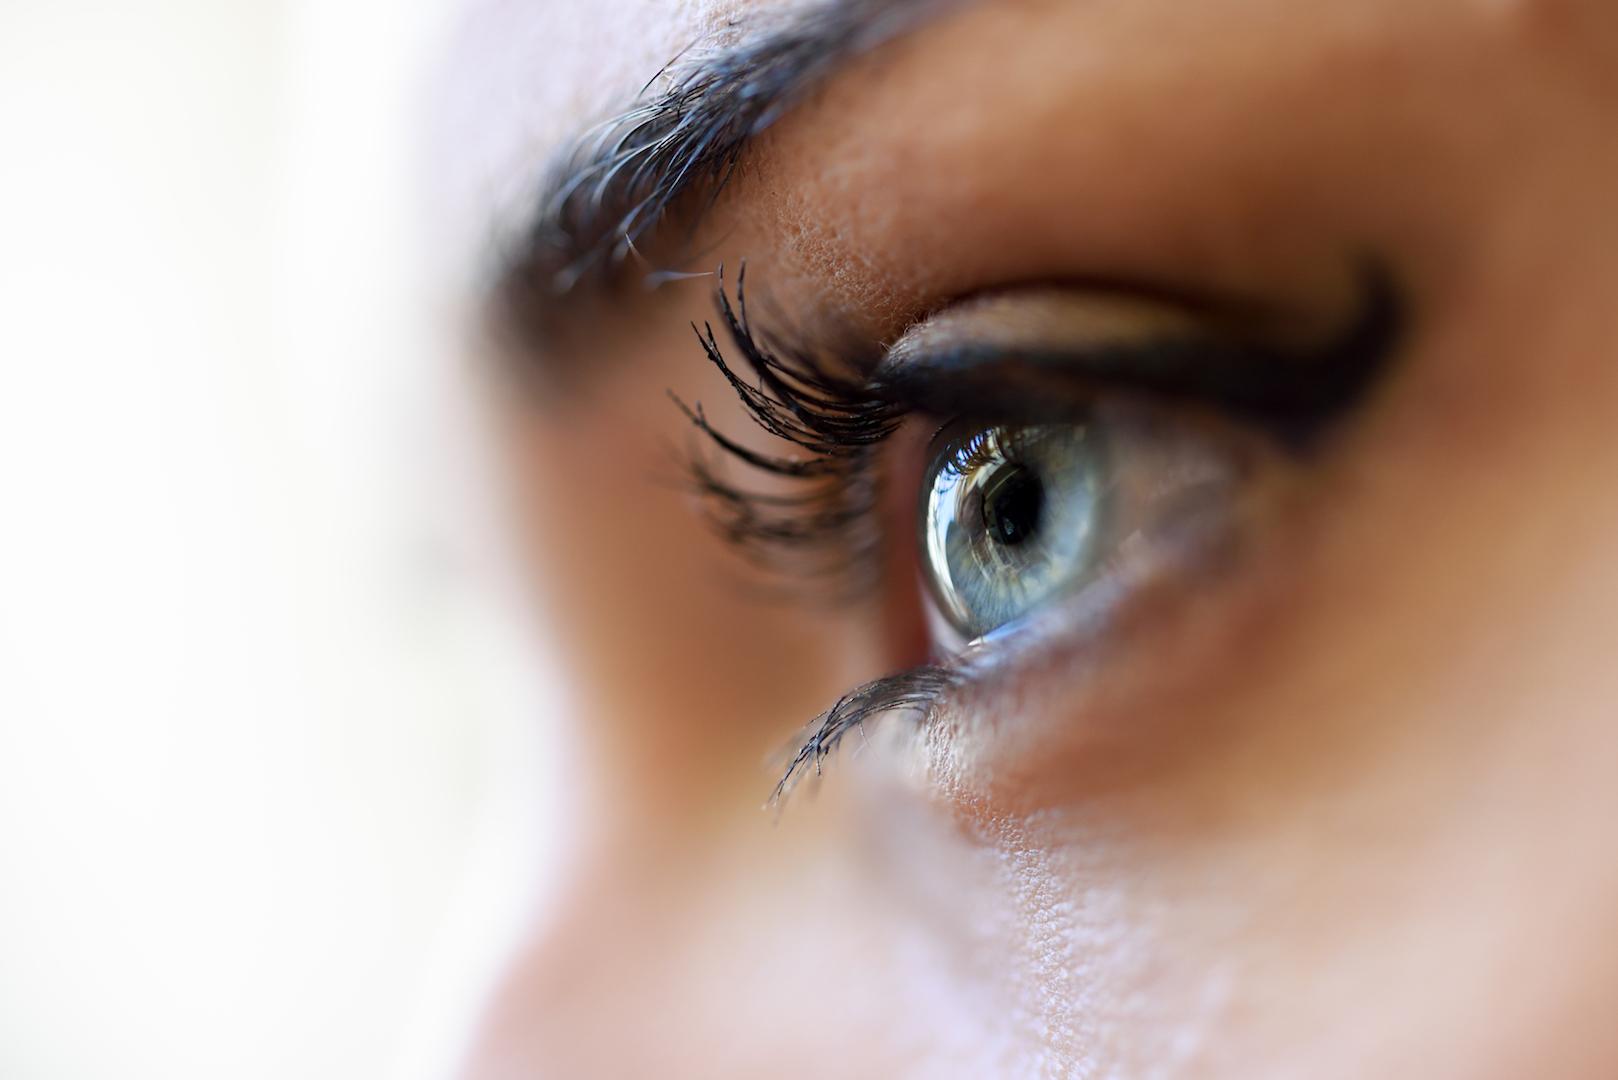 Vision Correction Surgery In Iran